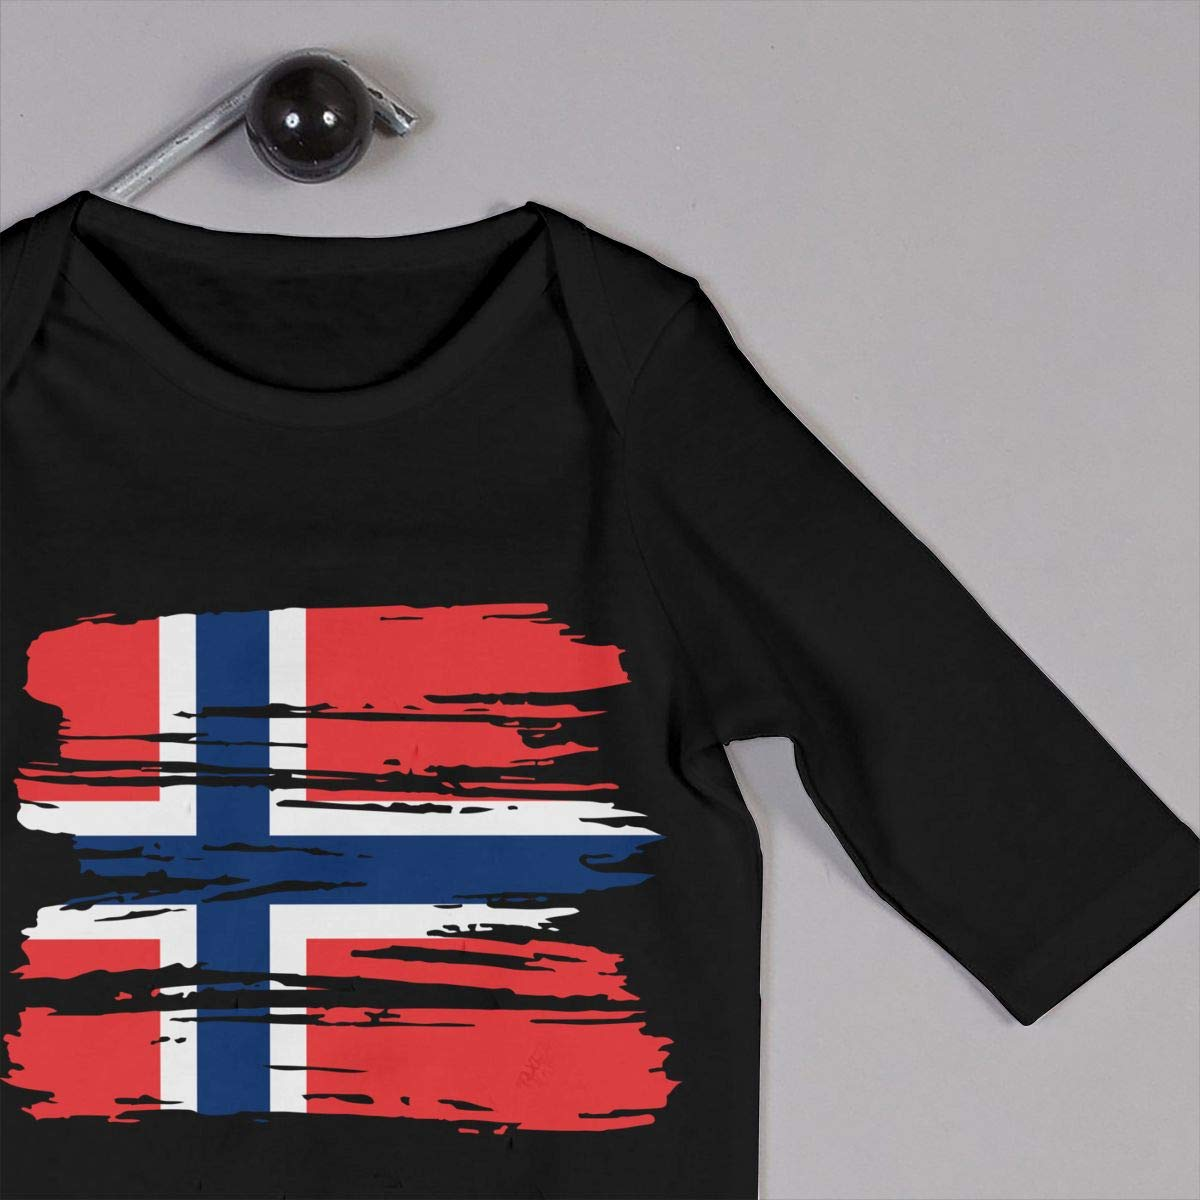 UGFGF-S3 Grunge Norway Flag Baby Girl Long Sleeve Romper Jumpsuit Infant Romper Jumpsuit